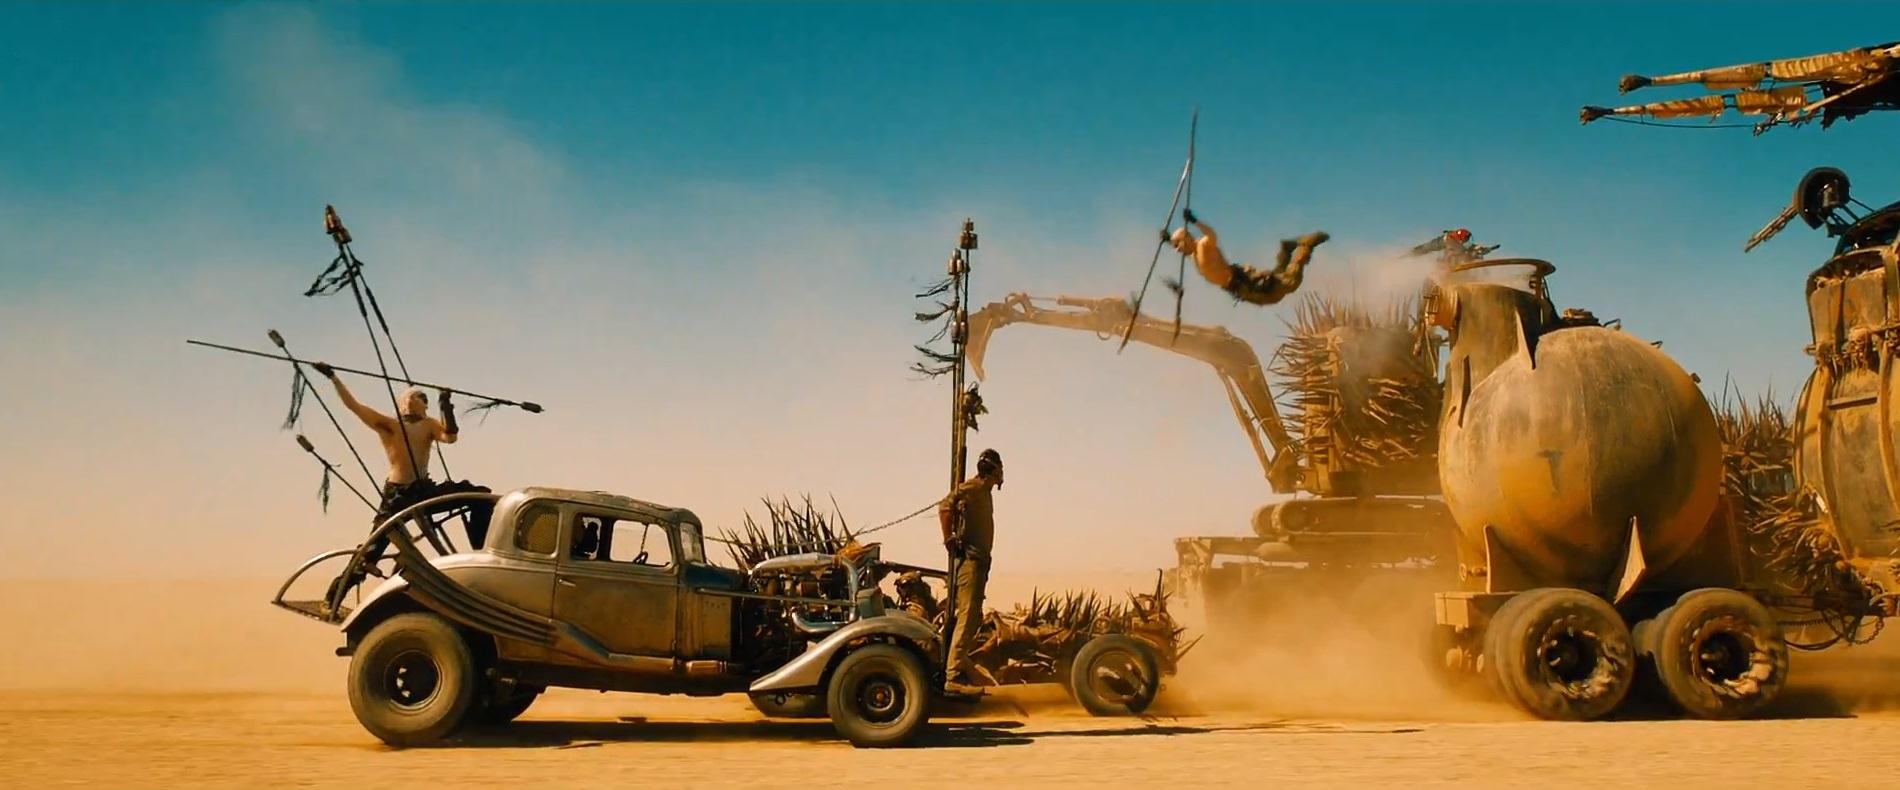 Mad Max Fury Road Wallpapers Comics Hq Mad Max Fury Road